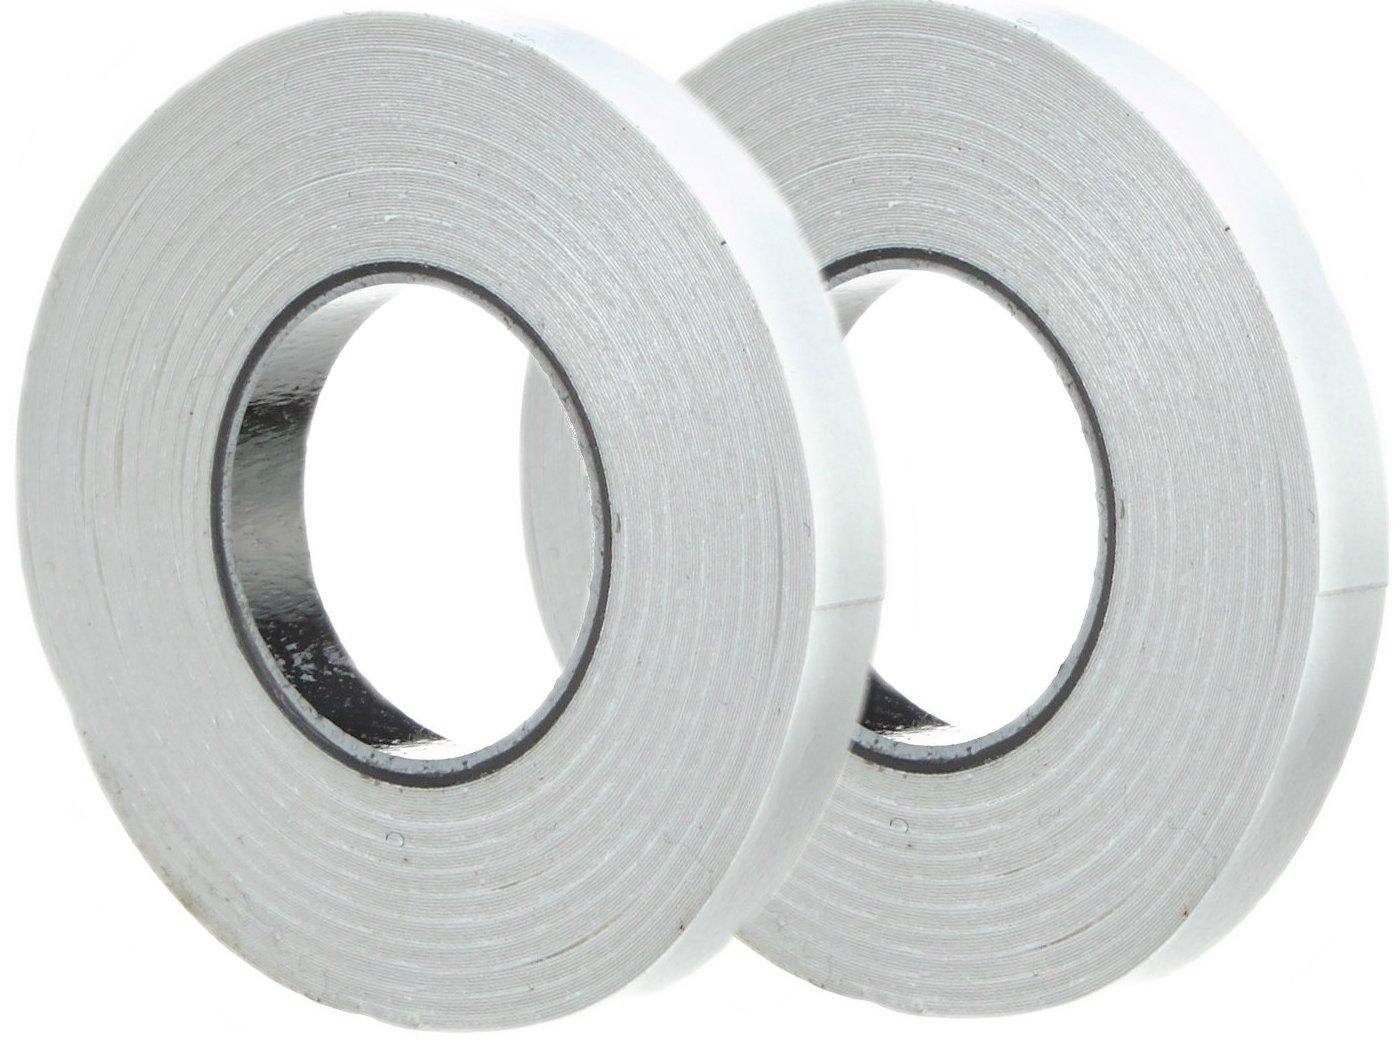 Ruban adhésif Wonder Tape par Prym - 6mm - Lot de 2 Prymx2